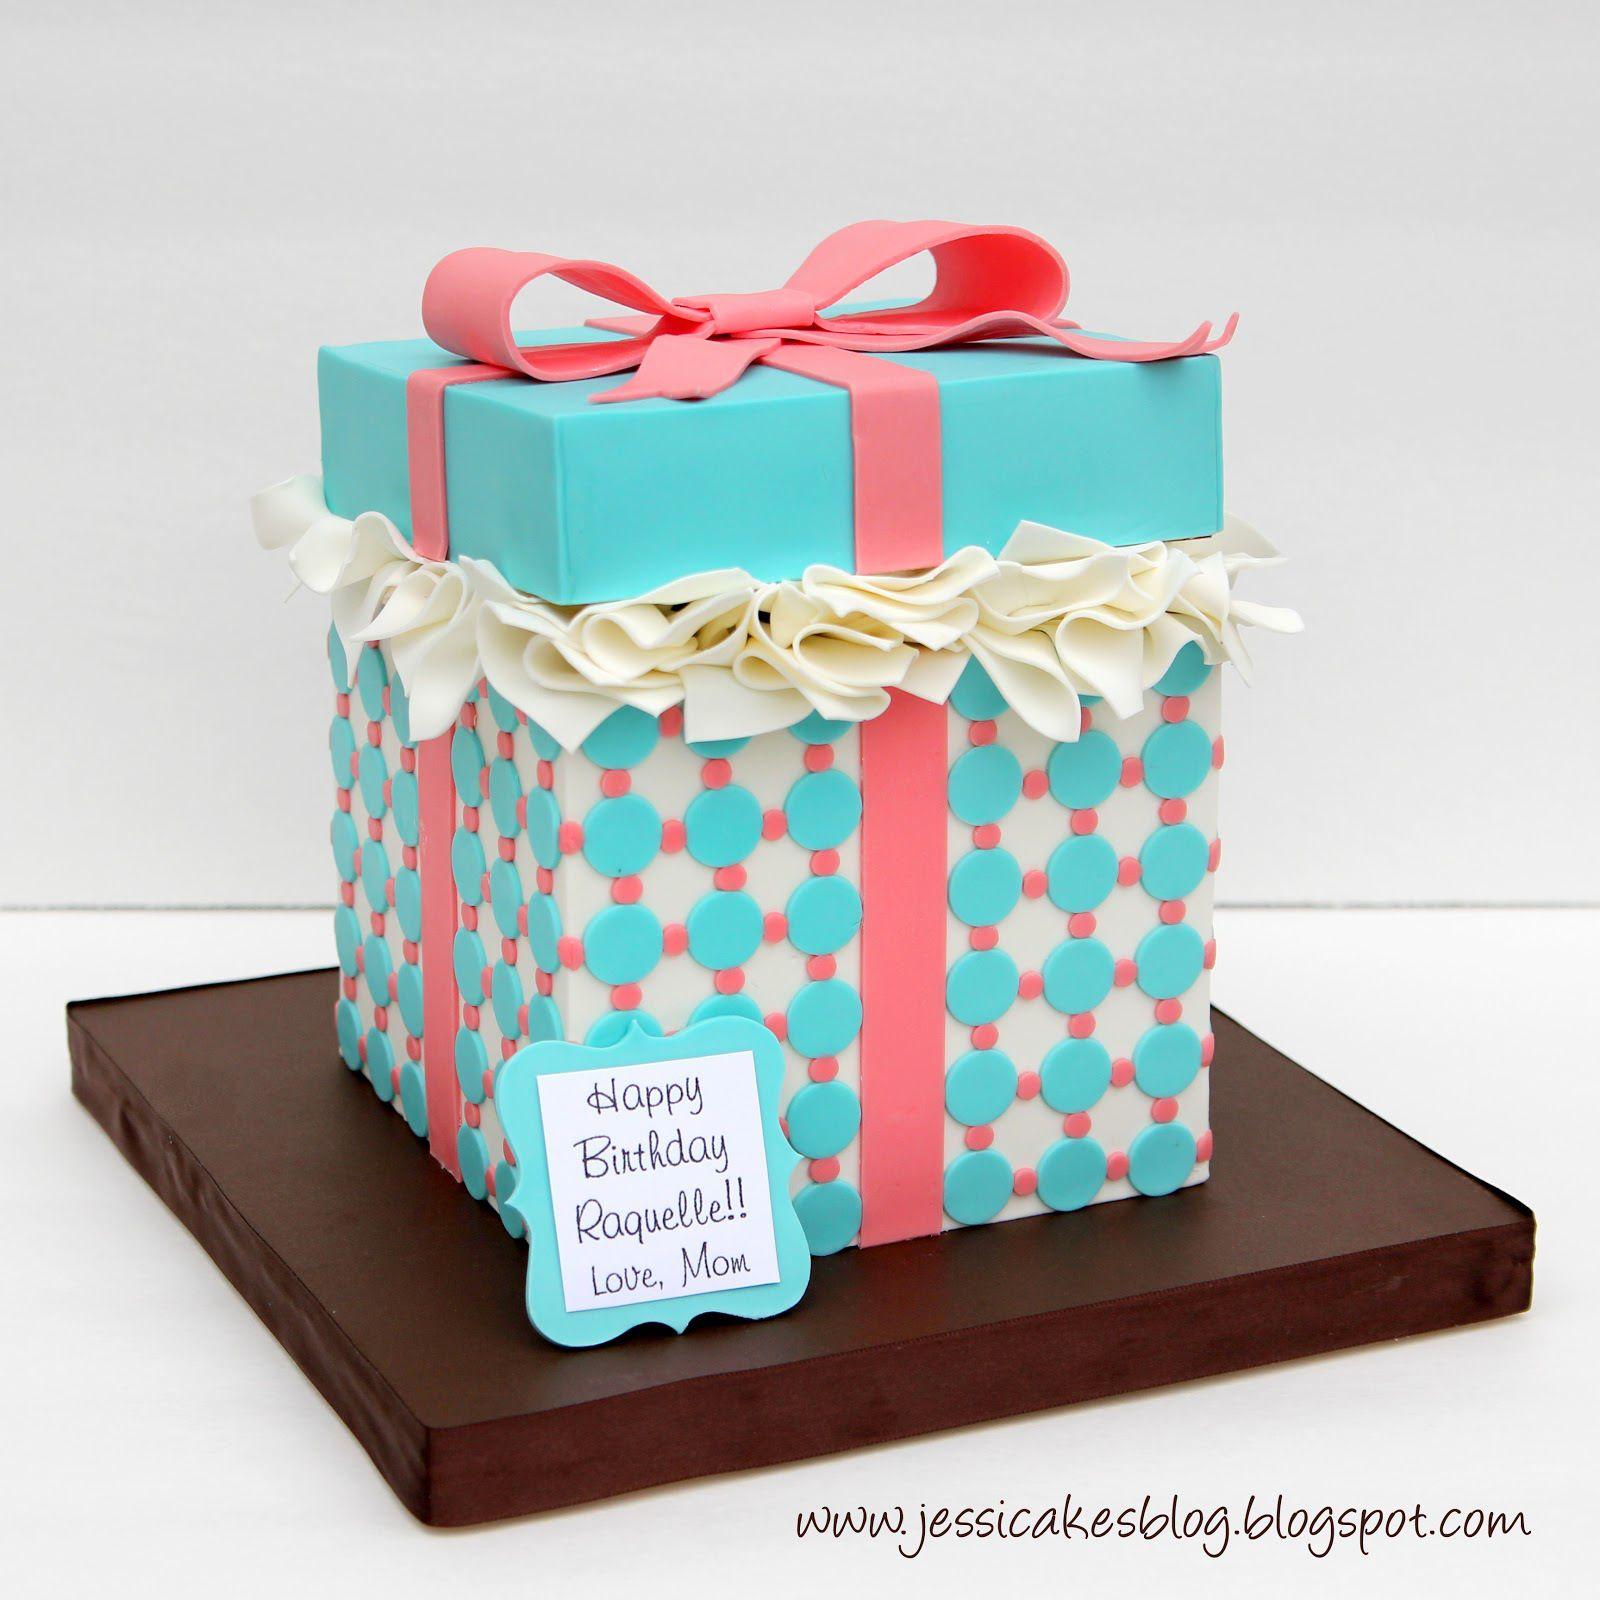 Gift box cake tutorial jessica harris cake design galletas gift box cake tutorial jessica harris cake design negle Images